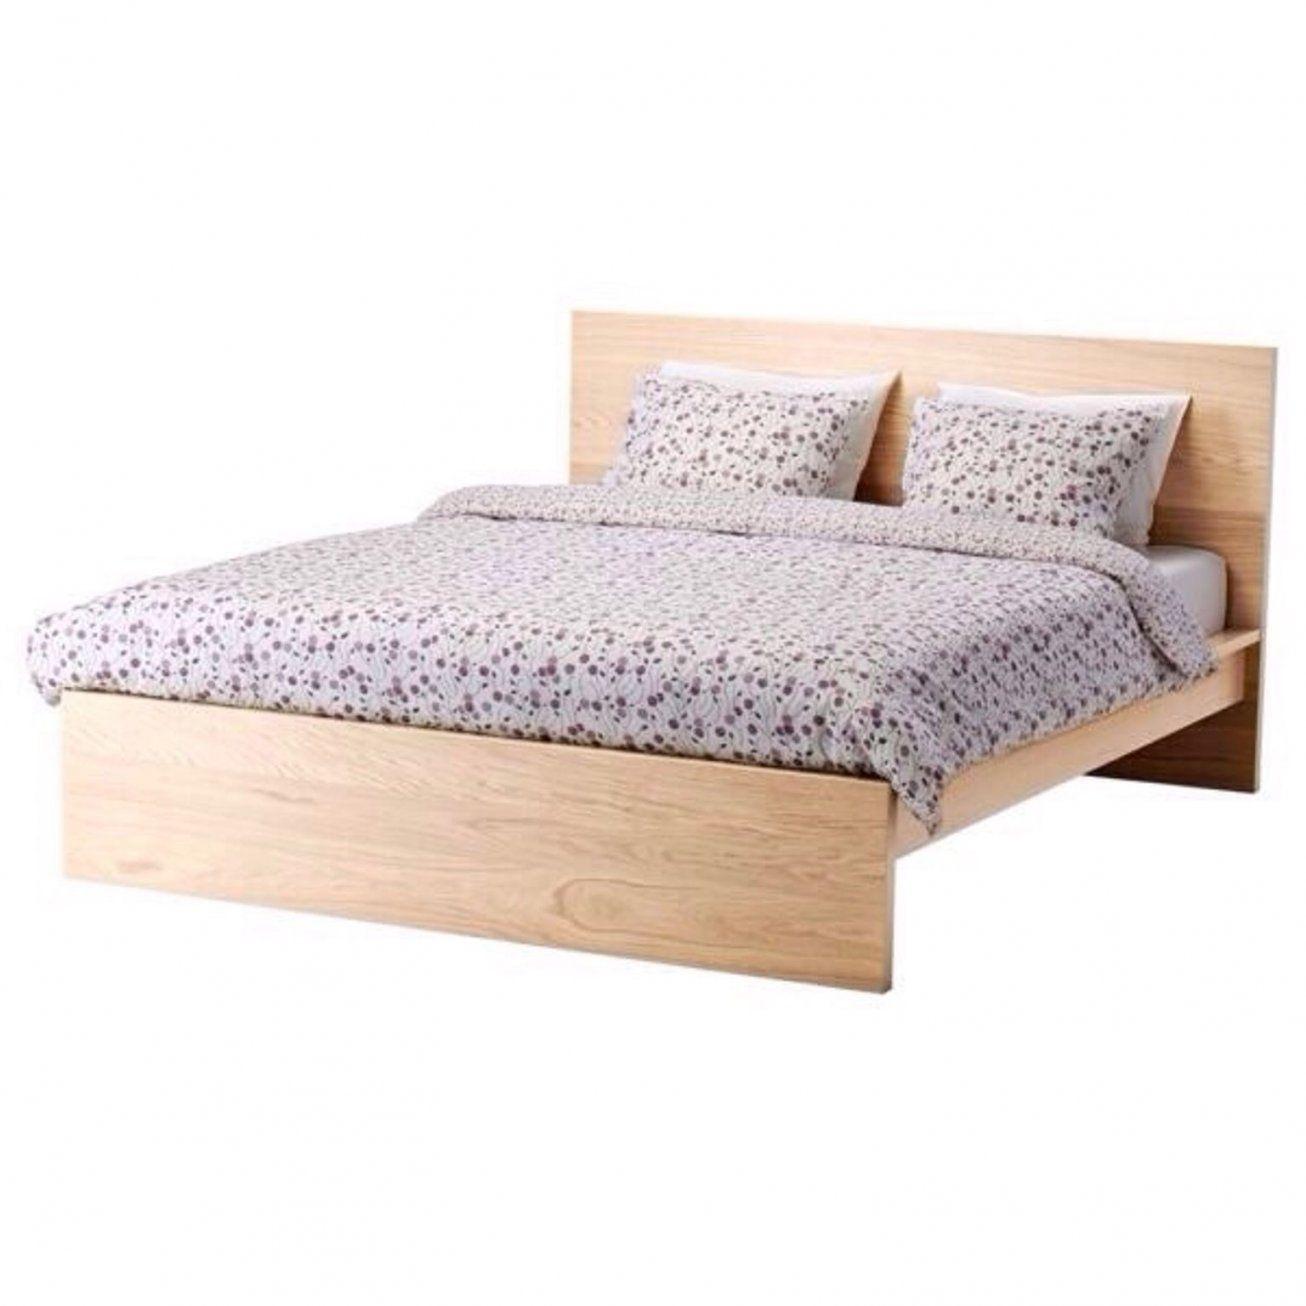 Gebraucht Ikea Malm Bett 160X200 In 31303 Burgdorf Um € 12000 – Shpock von Ikea Malm Bett 160X200 Birke Photo